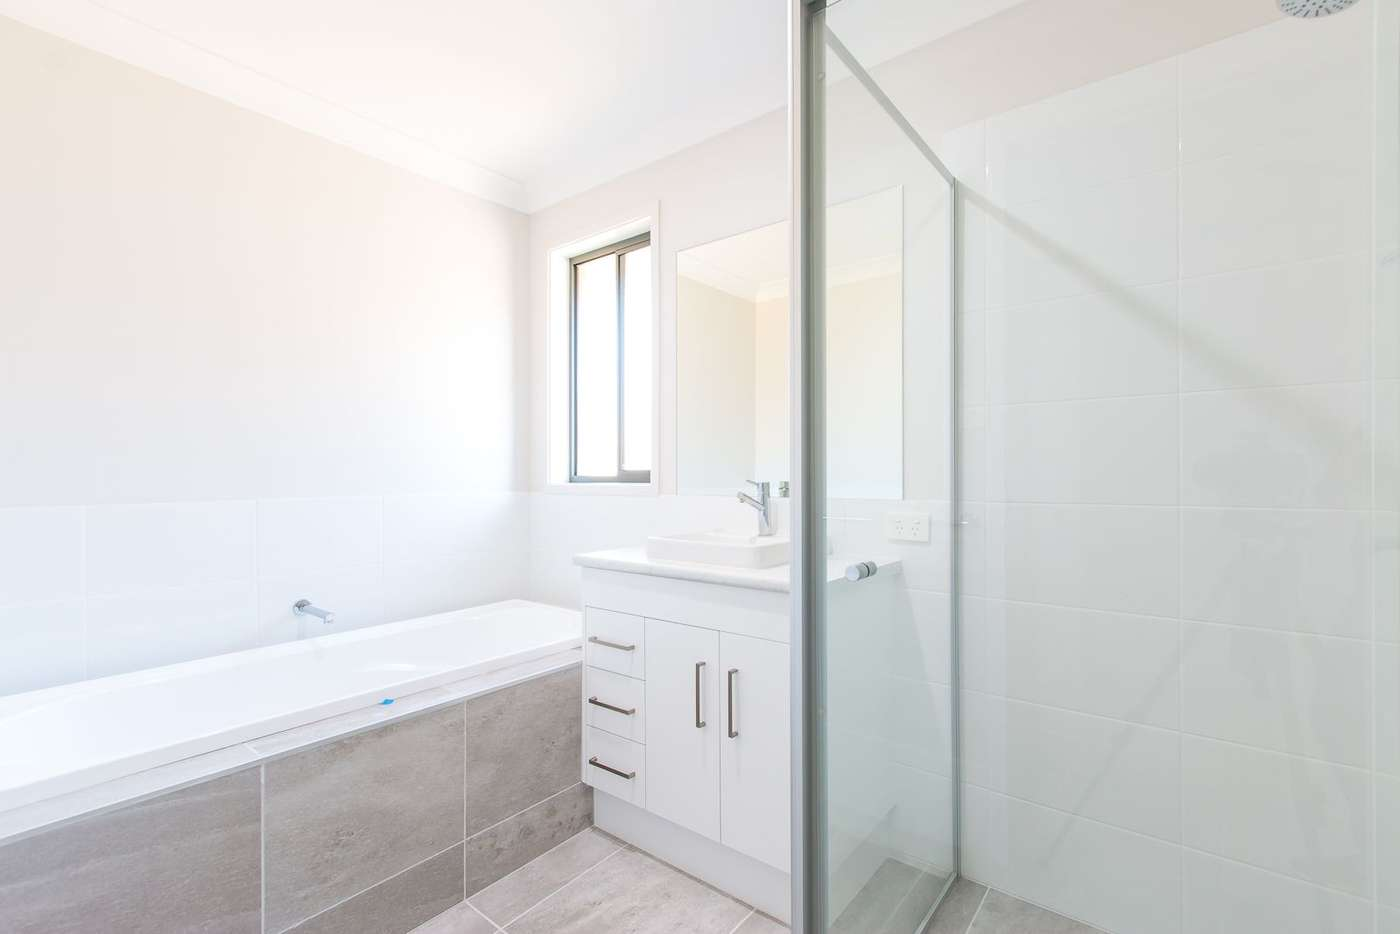 Sixth view of Homely house listing, 11 McNamara Street, Thornton NSW 2322